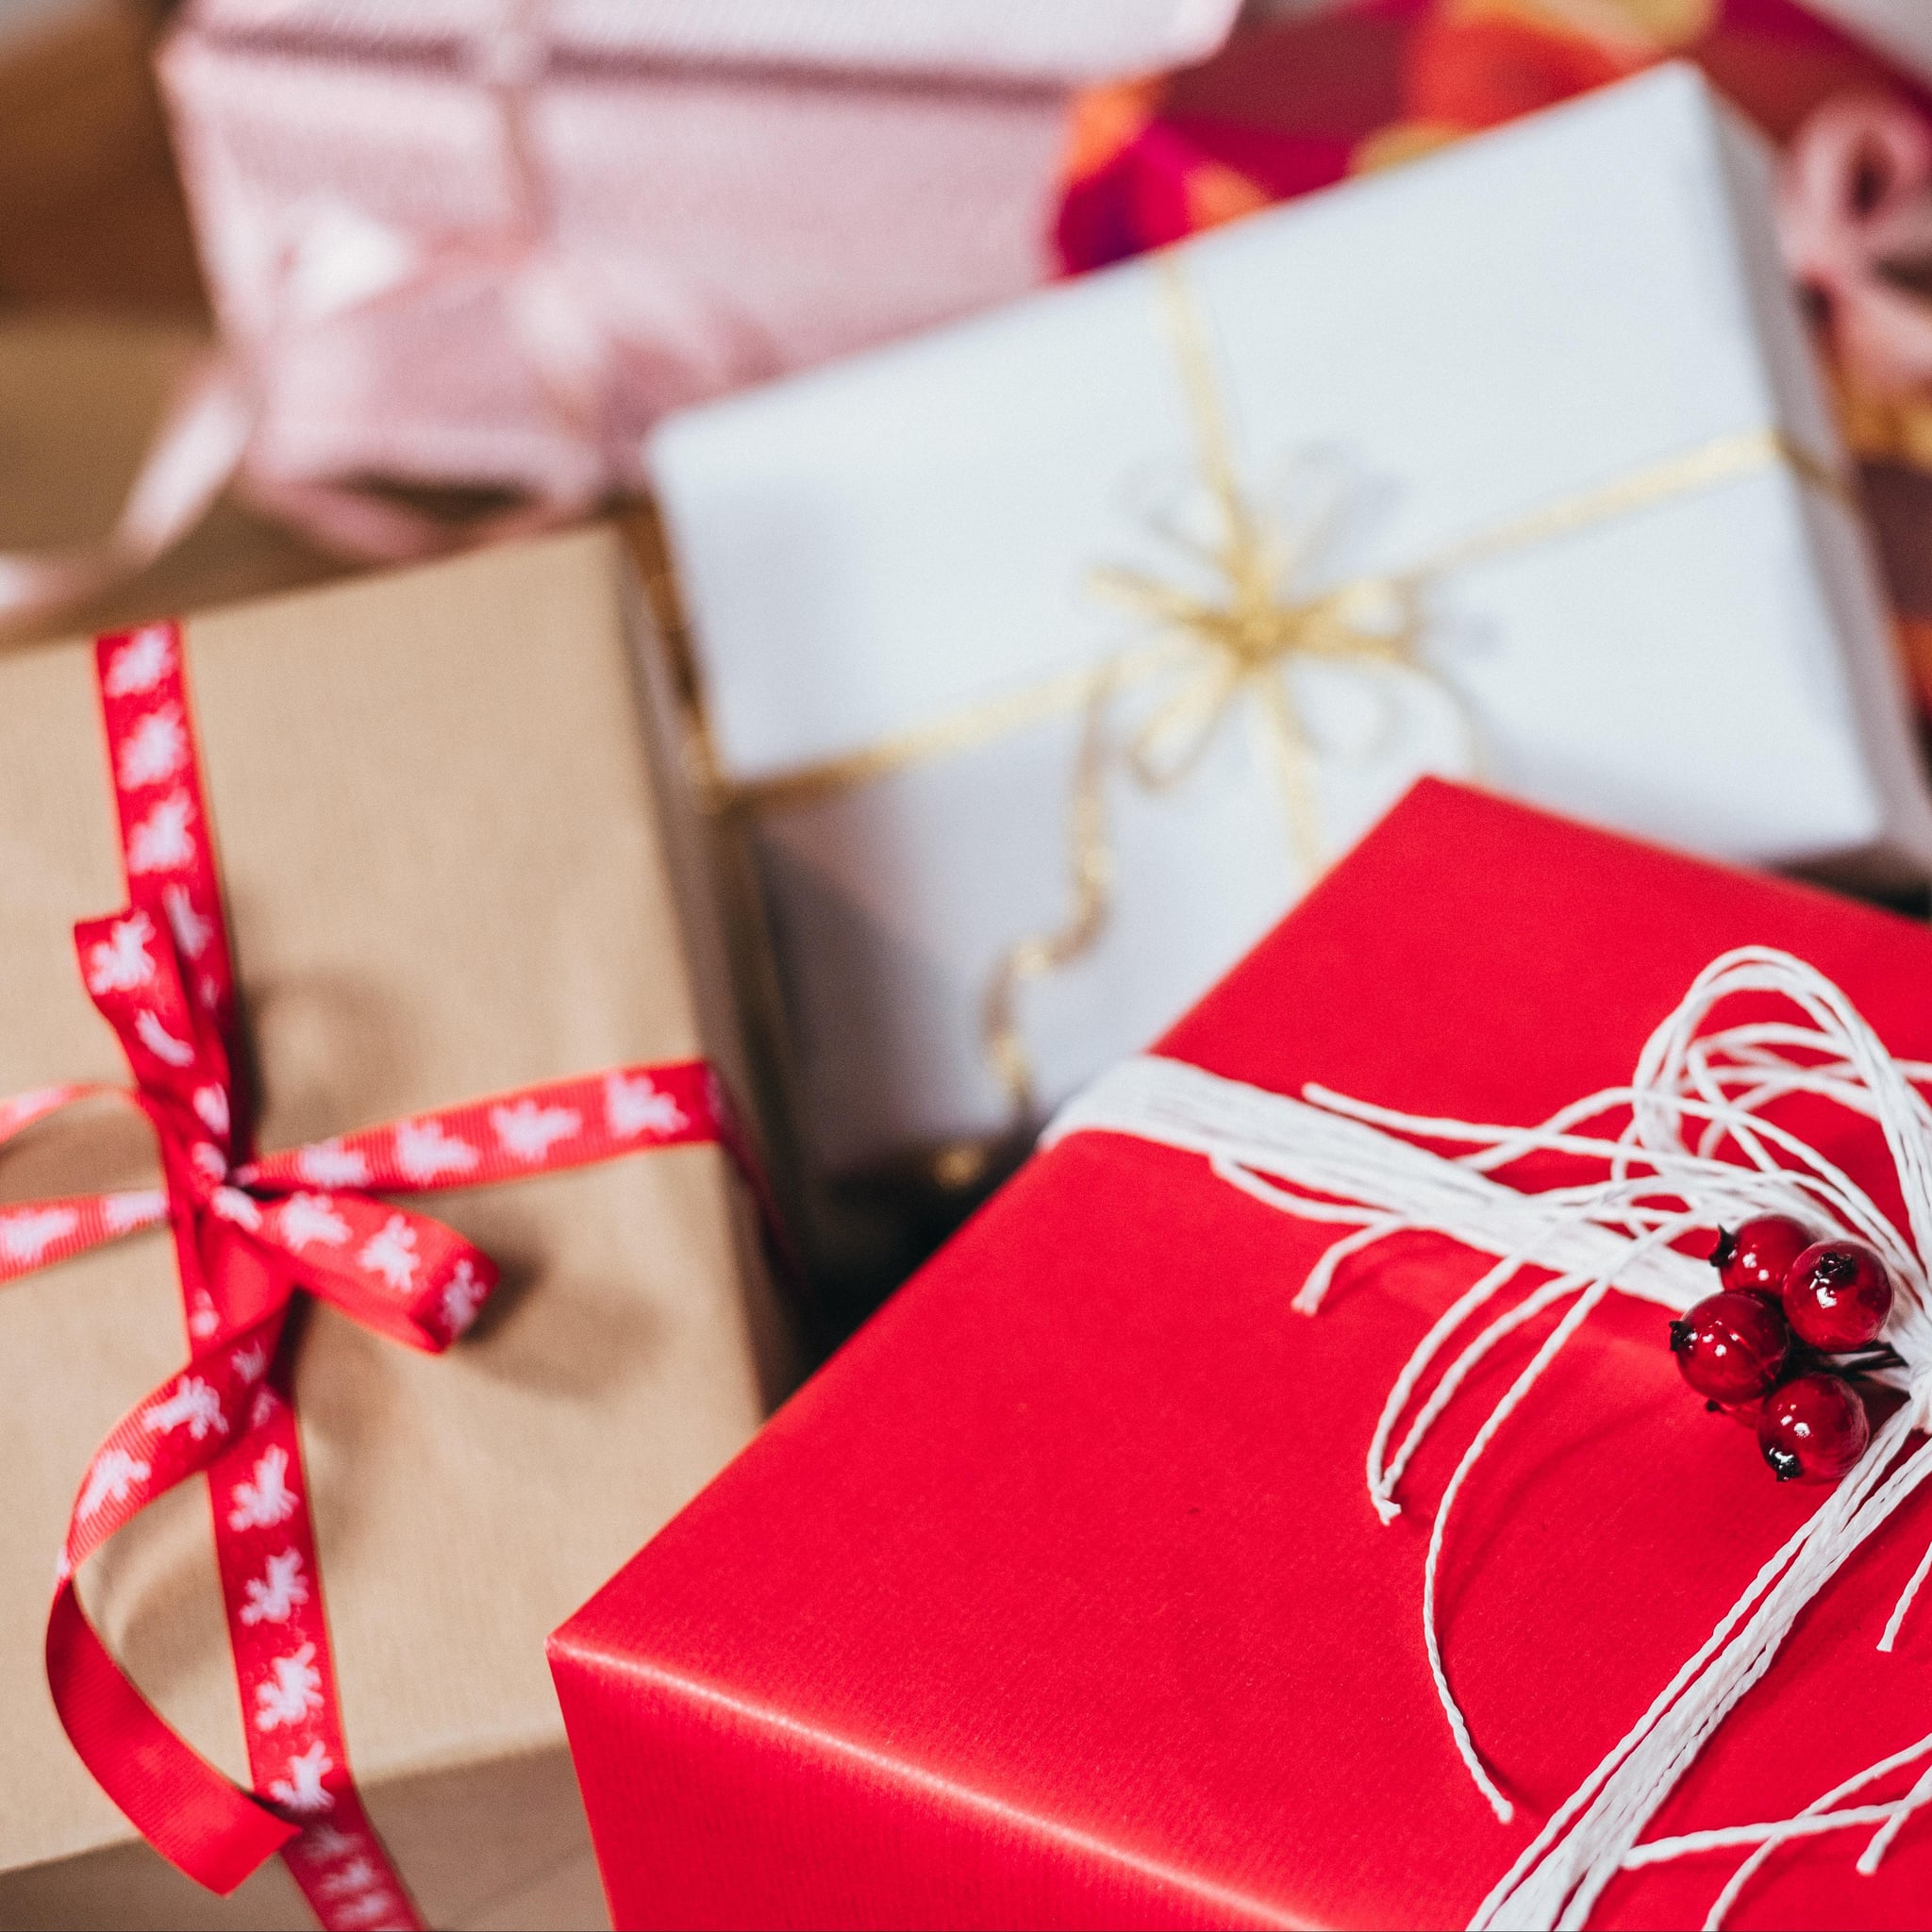 How to Prepare Early For Christmas | POPSUGAR Smart Living